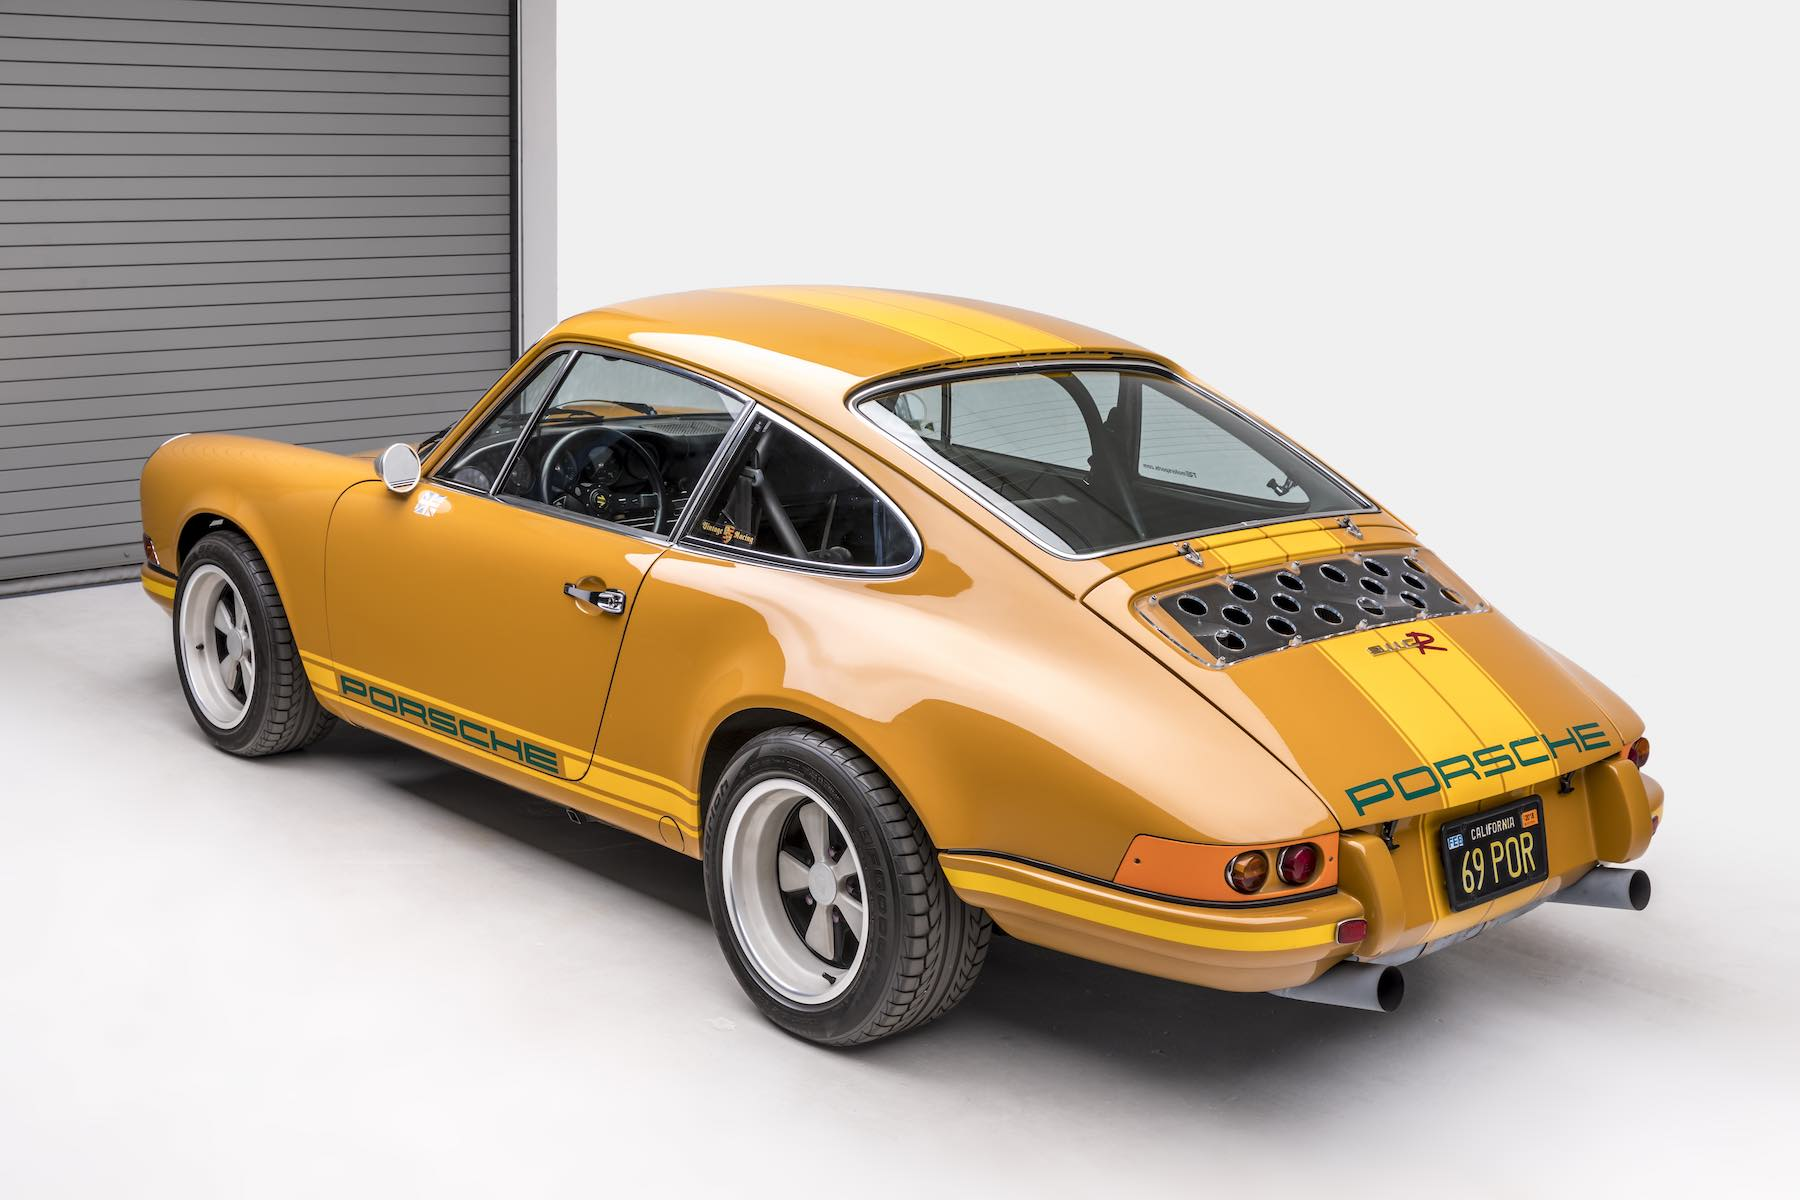 Rob Dickinson Singer Vehicle Design - 1969 911E first car - 12